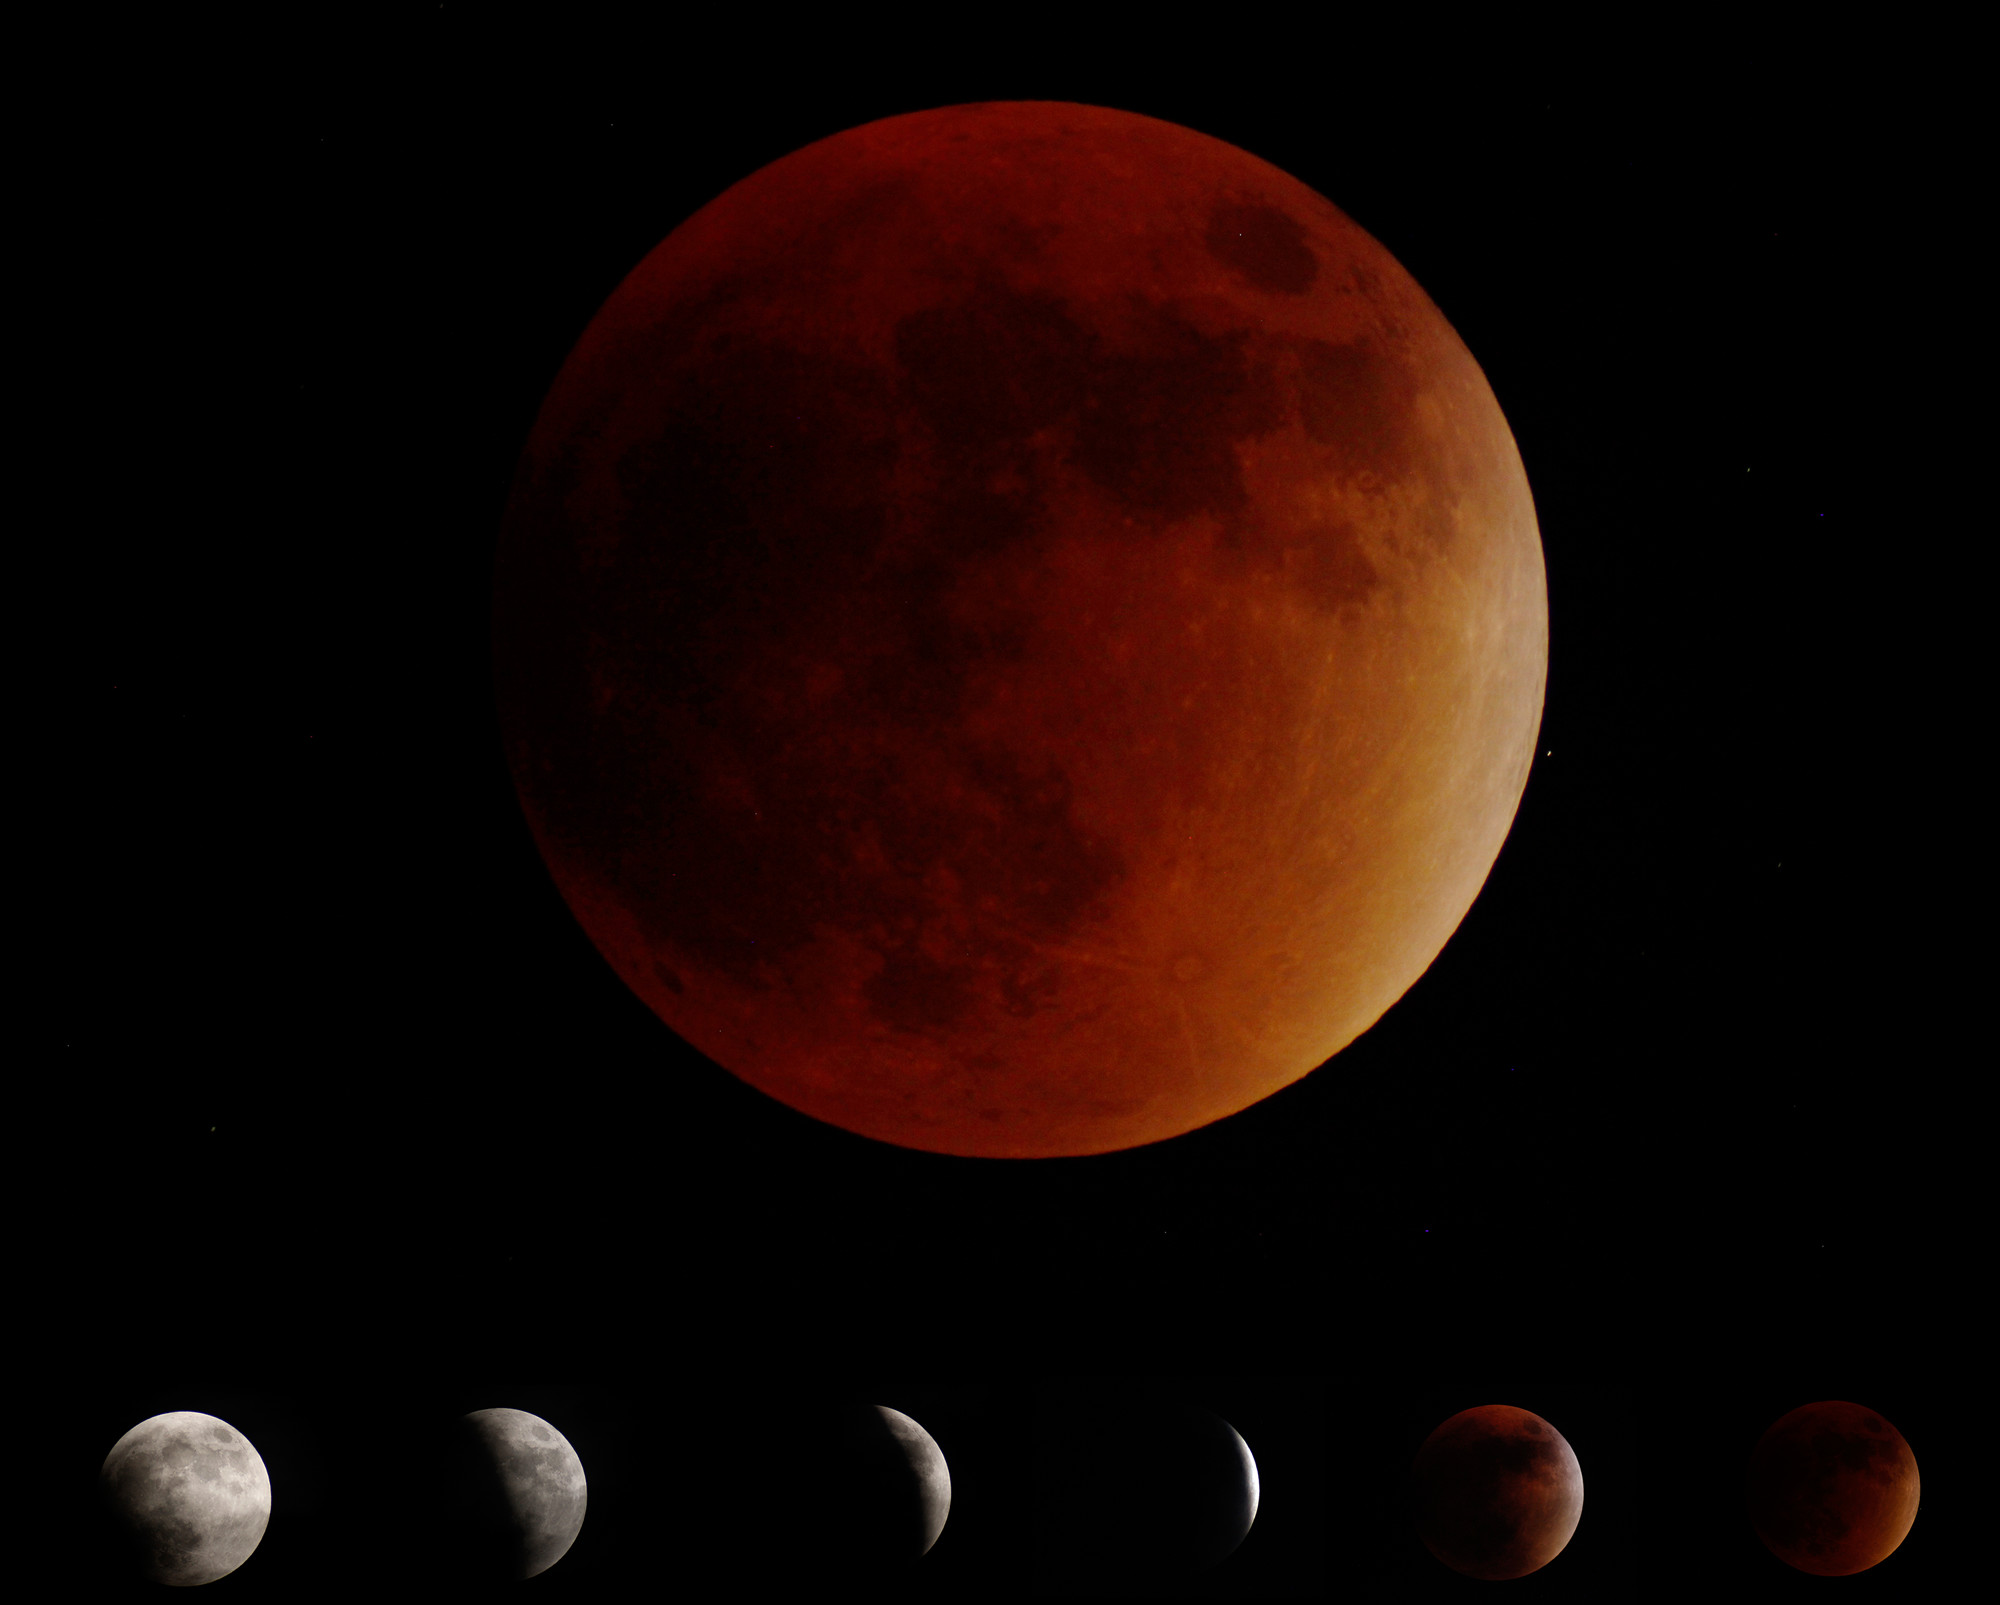 blood moon eclipse okc - photo #21